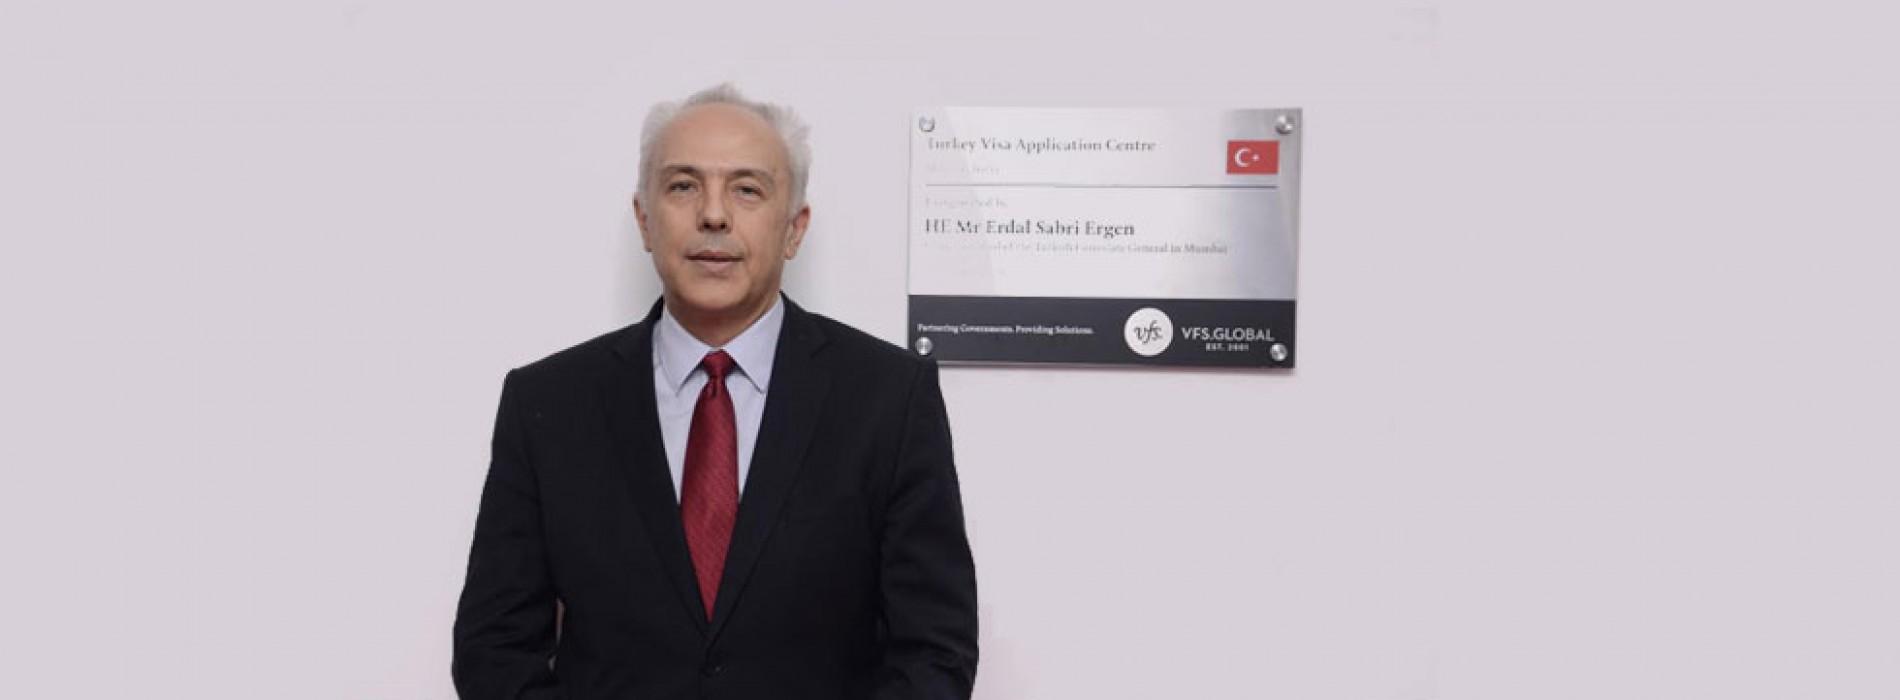 Turkey Visa Application Centre inaugurated in Mumbai, India